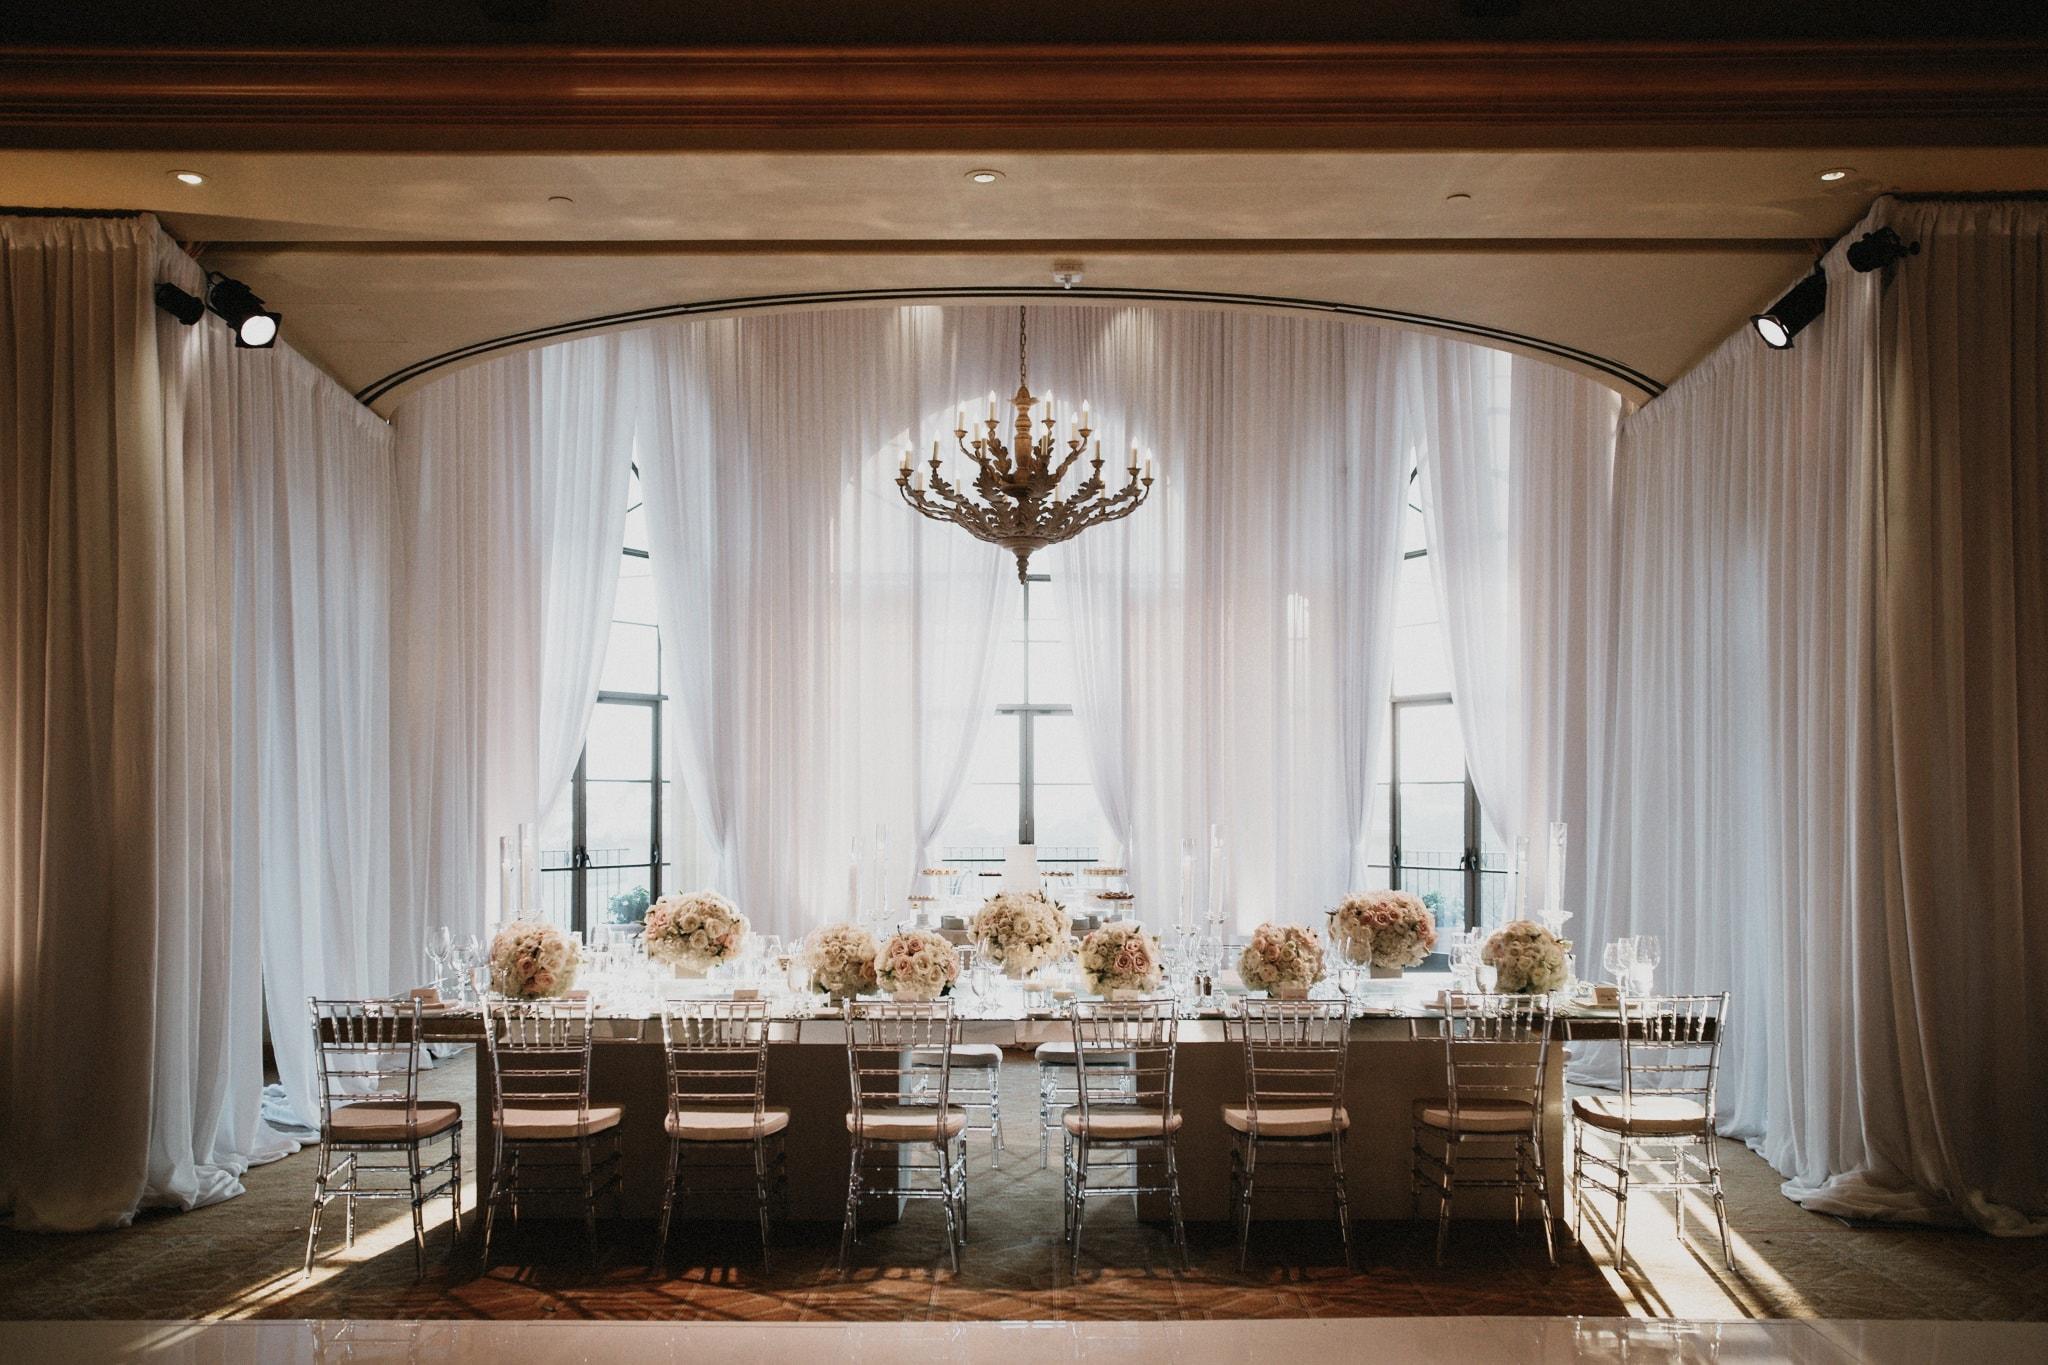 064-wedding-reception-venue-ideas.jpg